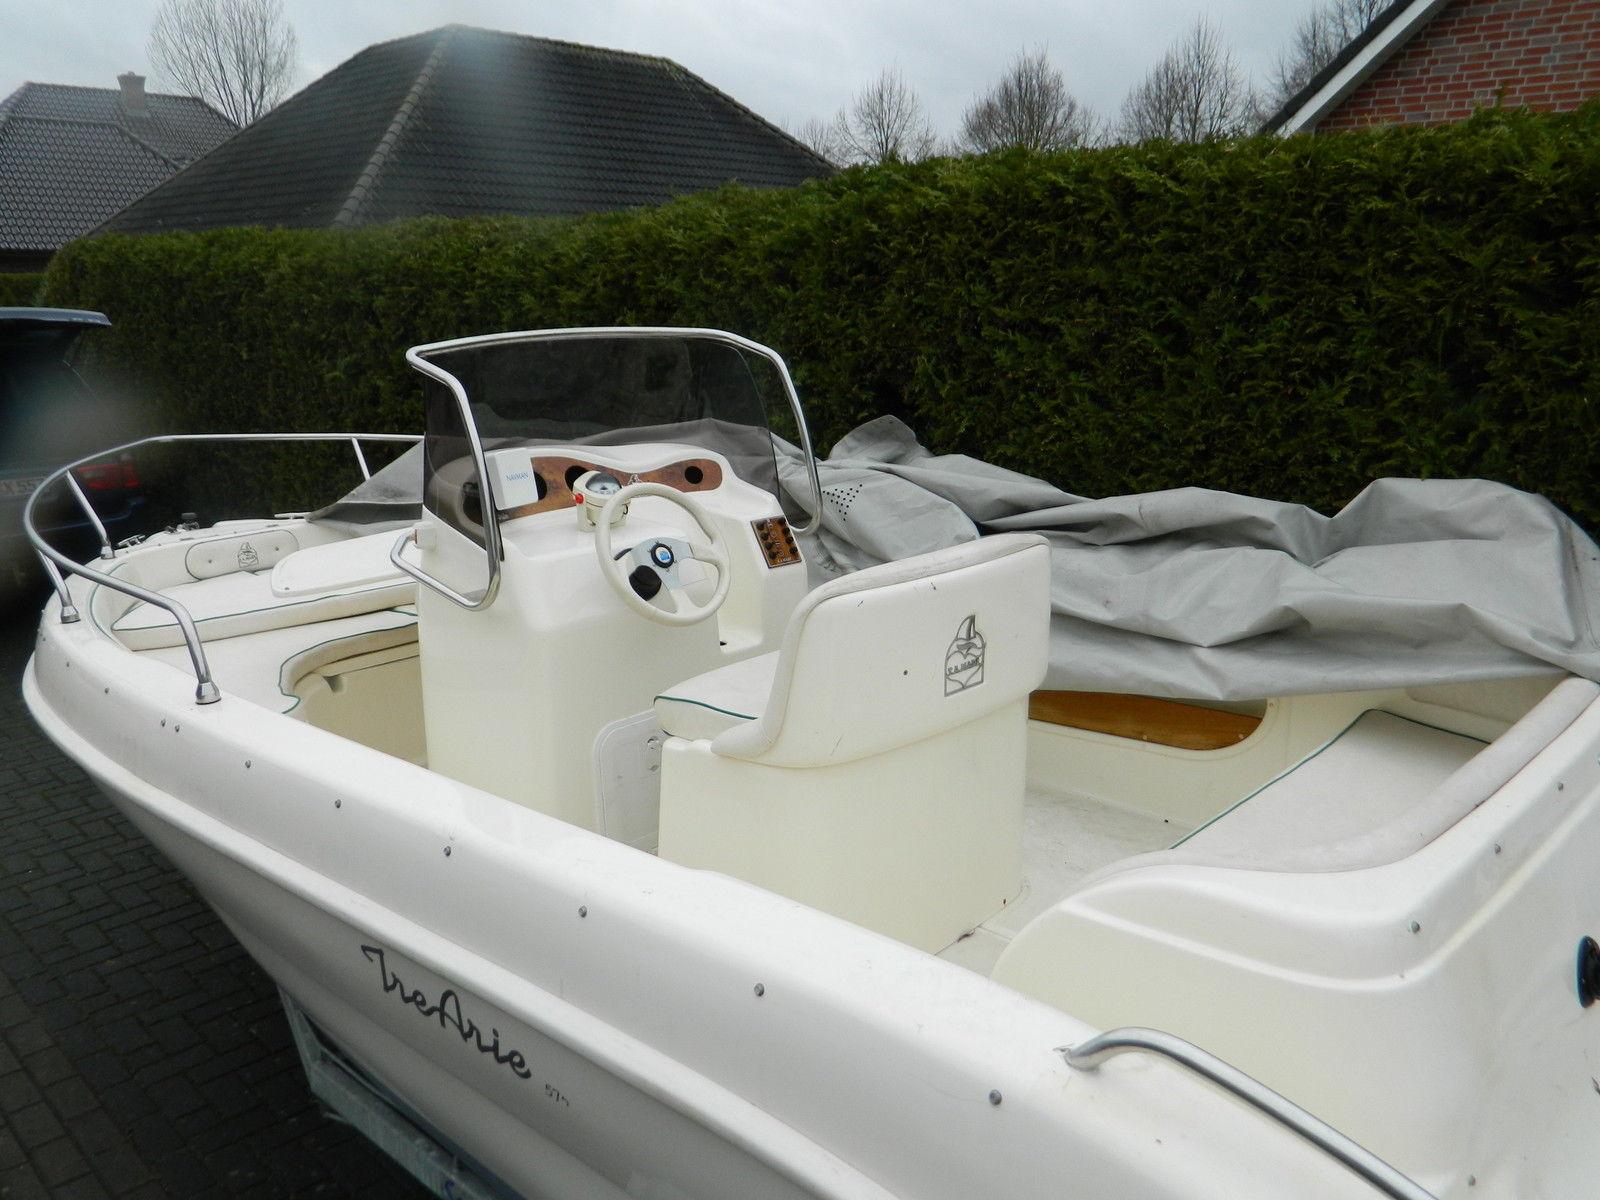 Sportboot, Konsolenboot bis 150 PS Maße 5,7m x 2,4m T.A. Mare Tri Arie 19 Fuss